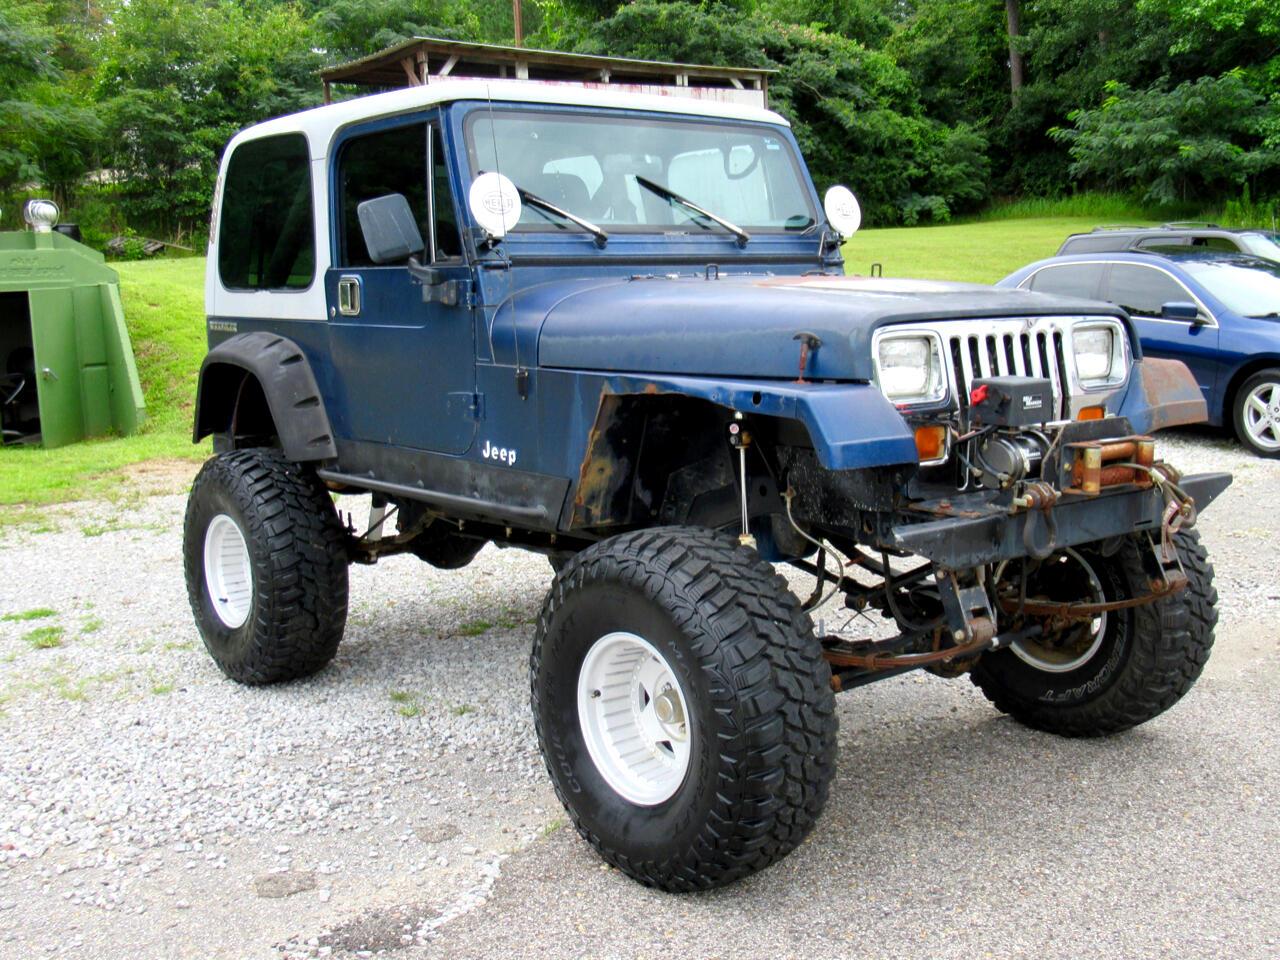 Jeep Wrangler 2dr Base 1990